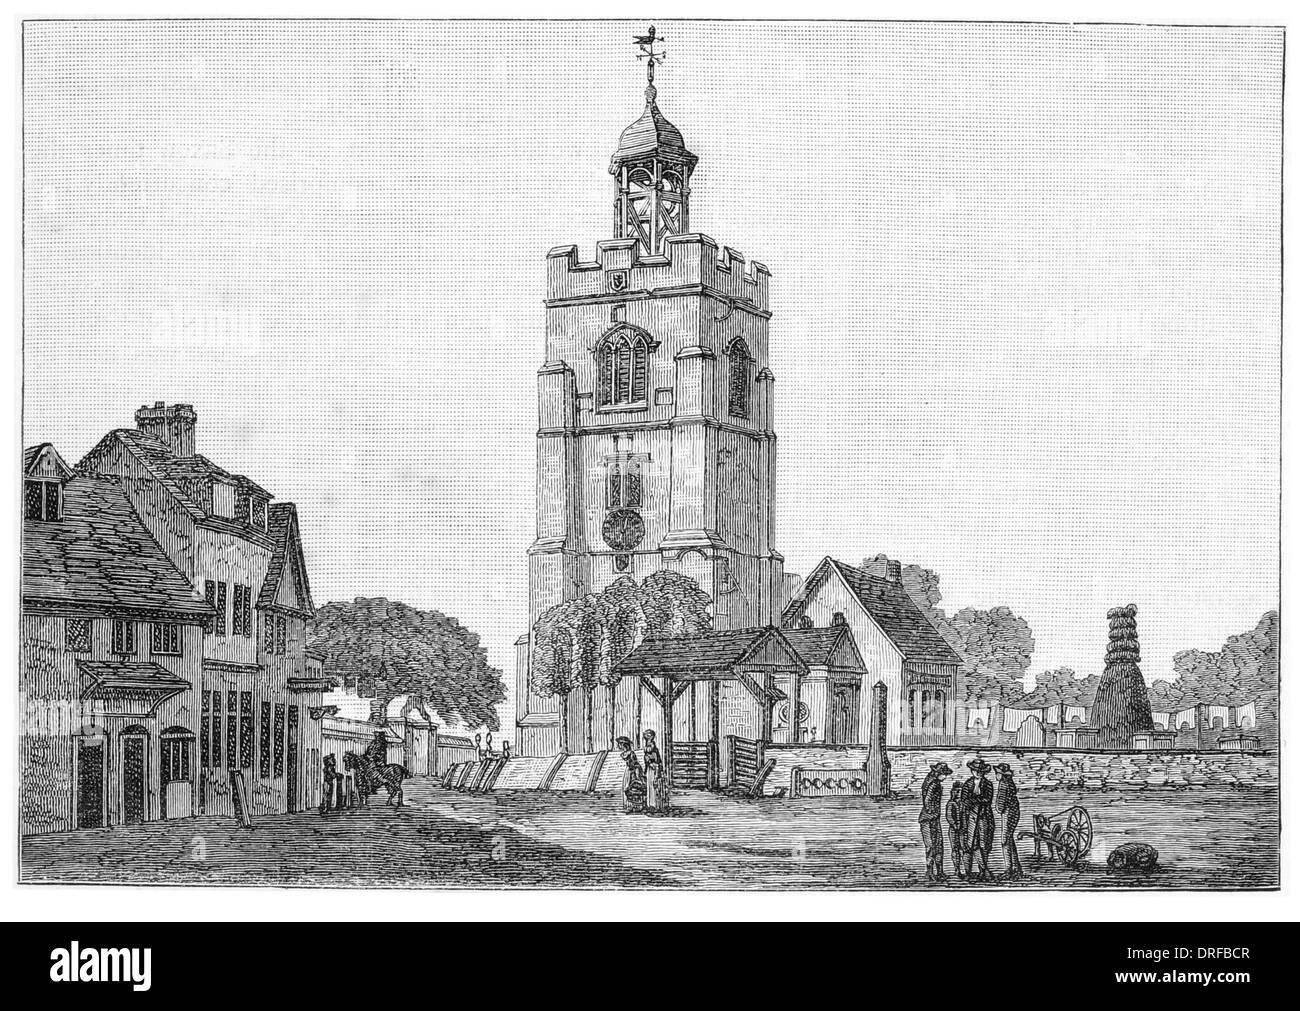 London Borough of Hillingdon, Church of St John the Baptist 1740 - Stock Image